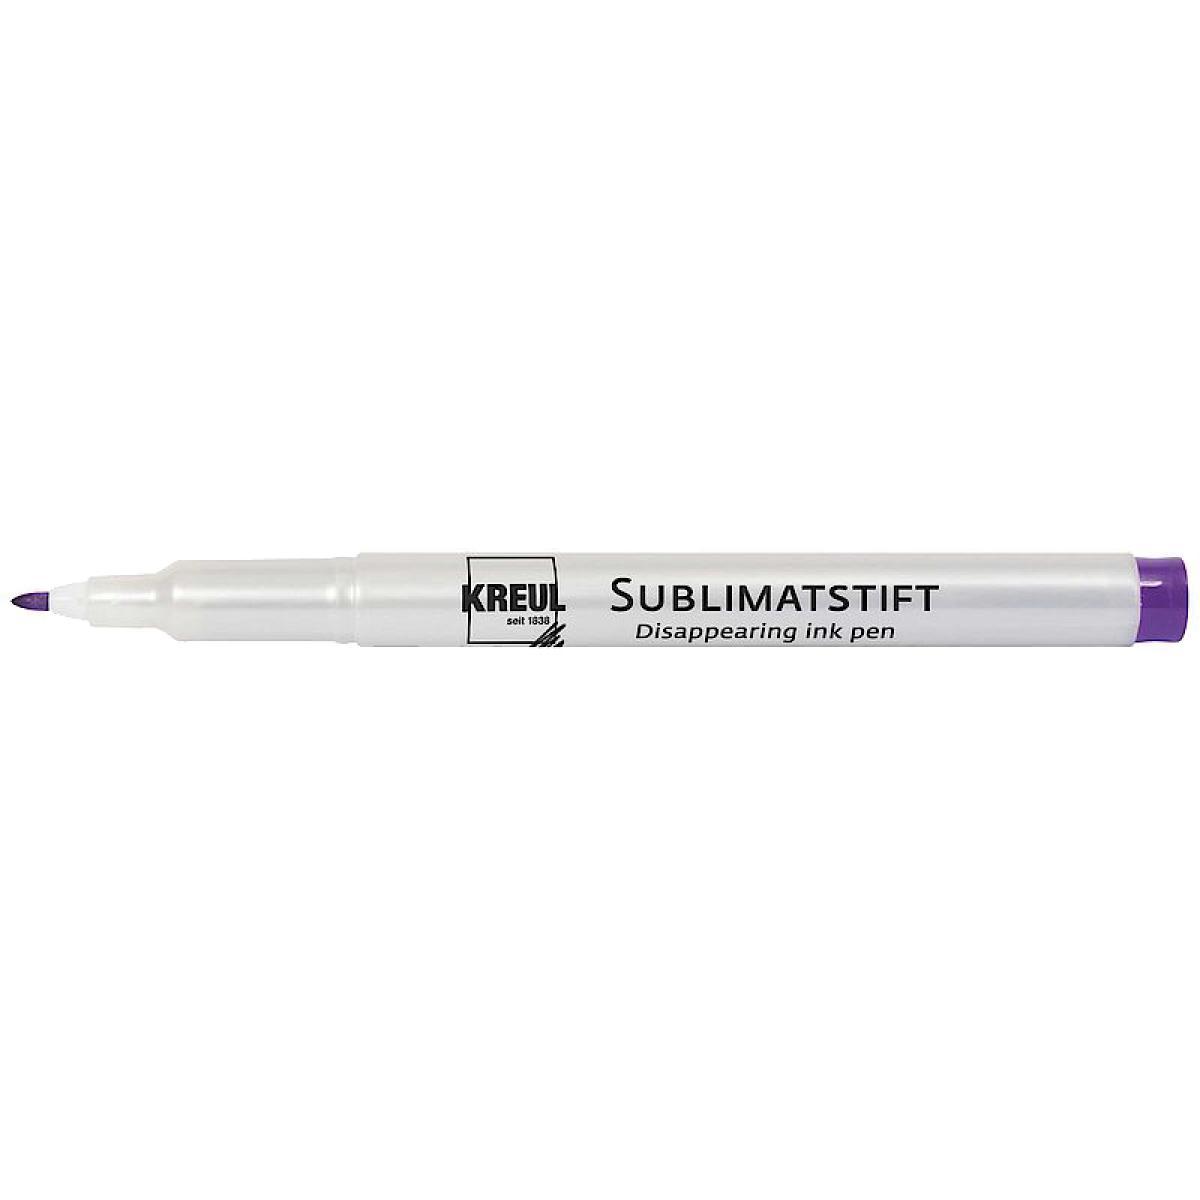 KREUL Sublimatstift - selbstlöschender Phantomstift (818080) (4000798180805)